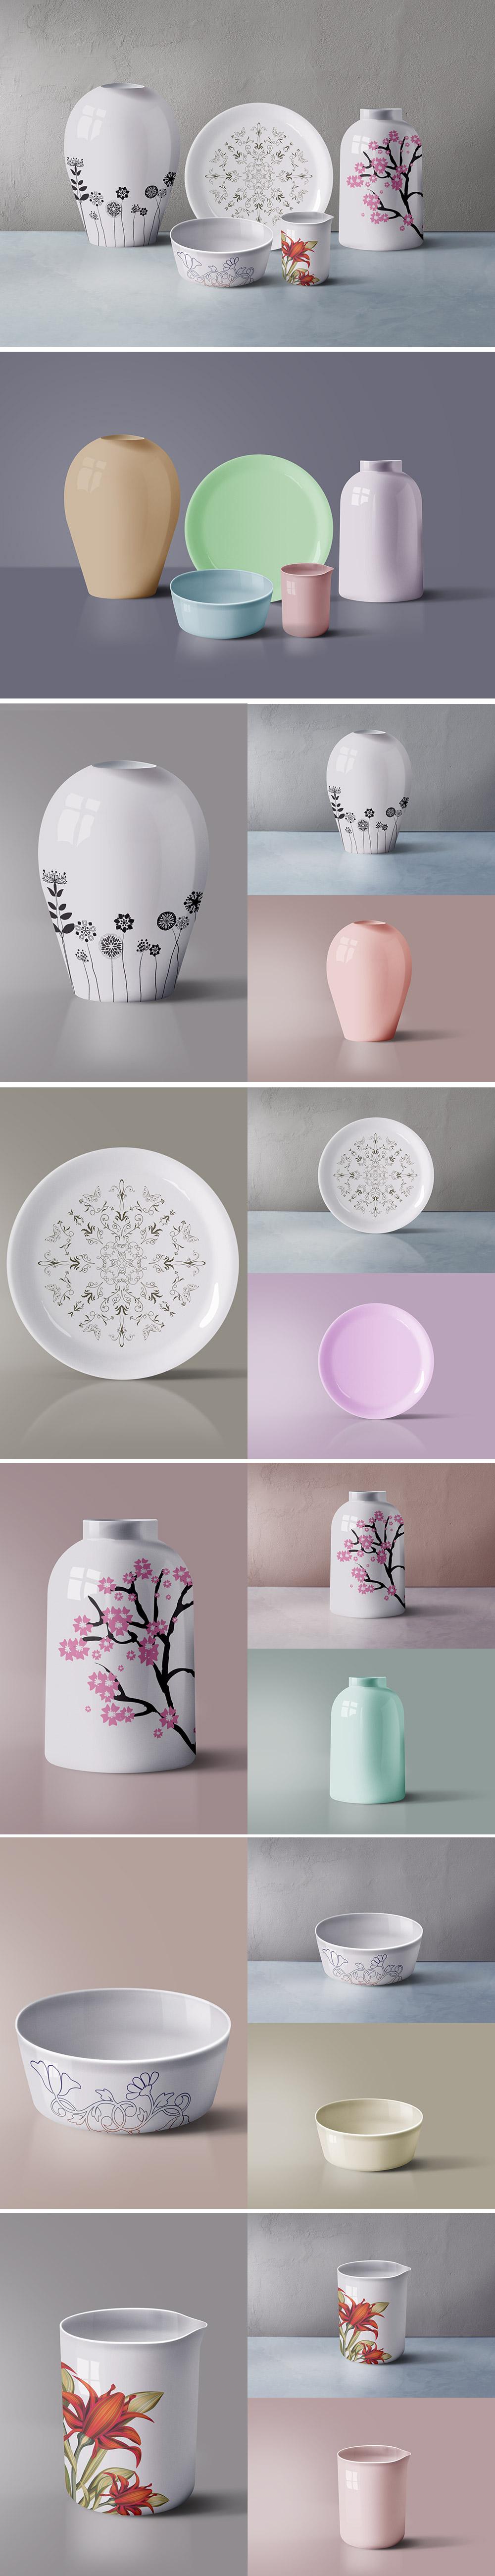 Ceramic Tableware Mockup